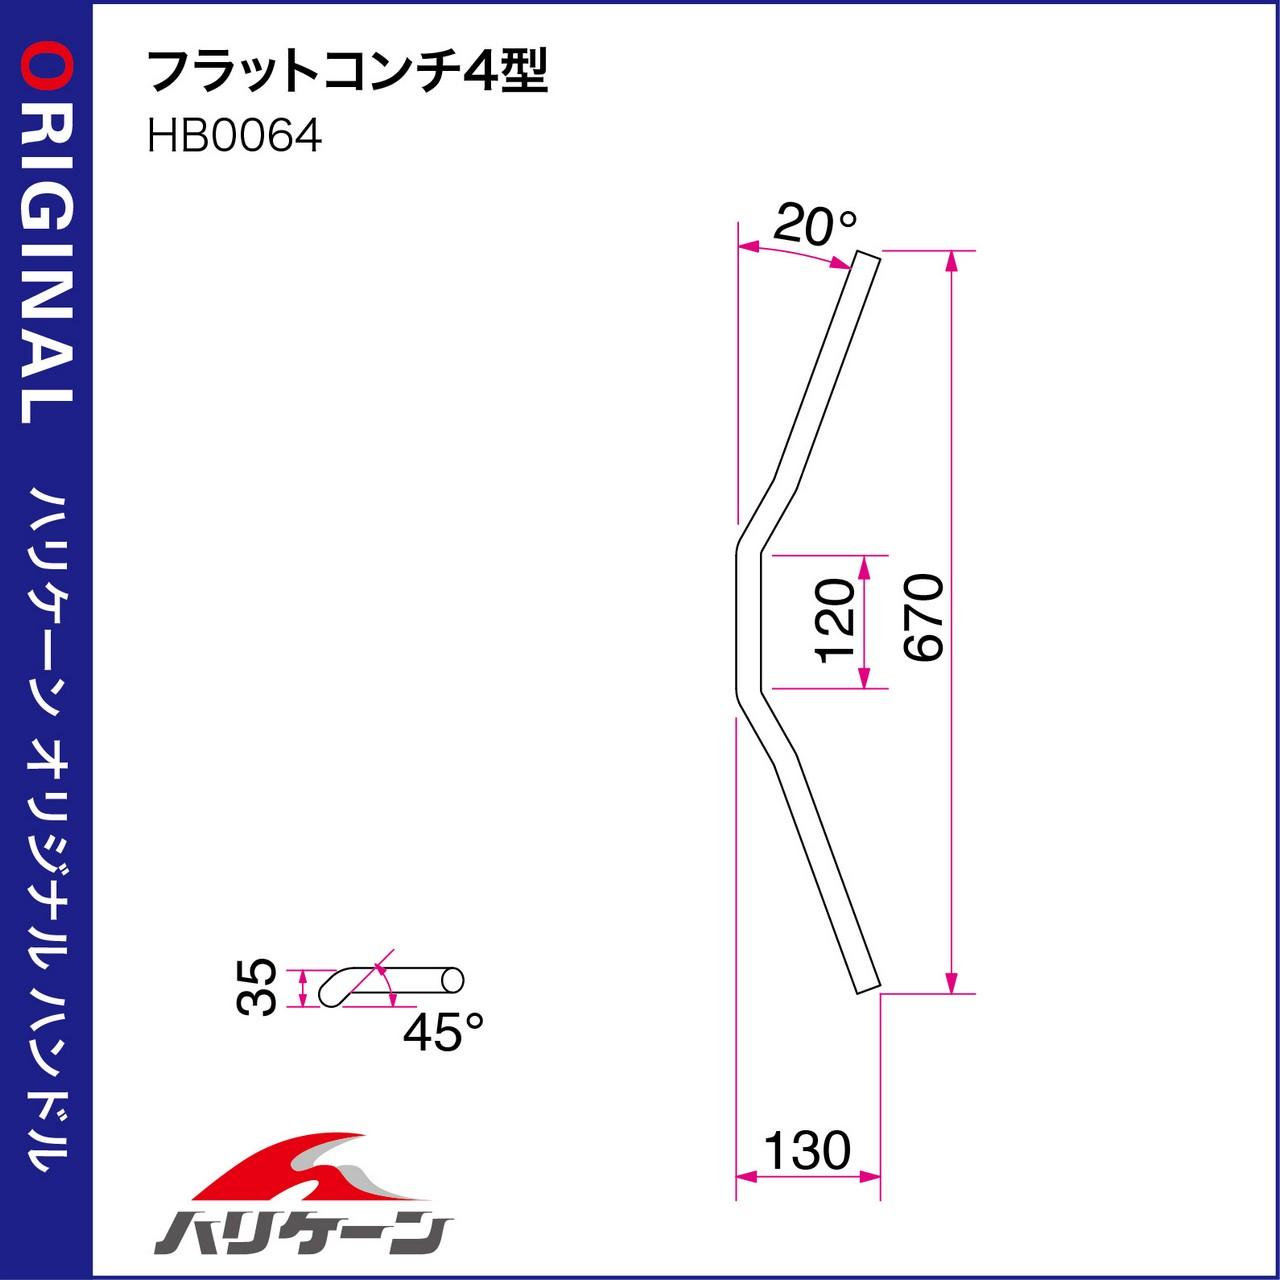 【HURRICANE】Flat Continental Type 4 Φ 7/8 吋 鋼製把手 - 「Webike-摩托百貨」